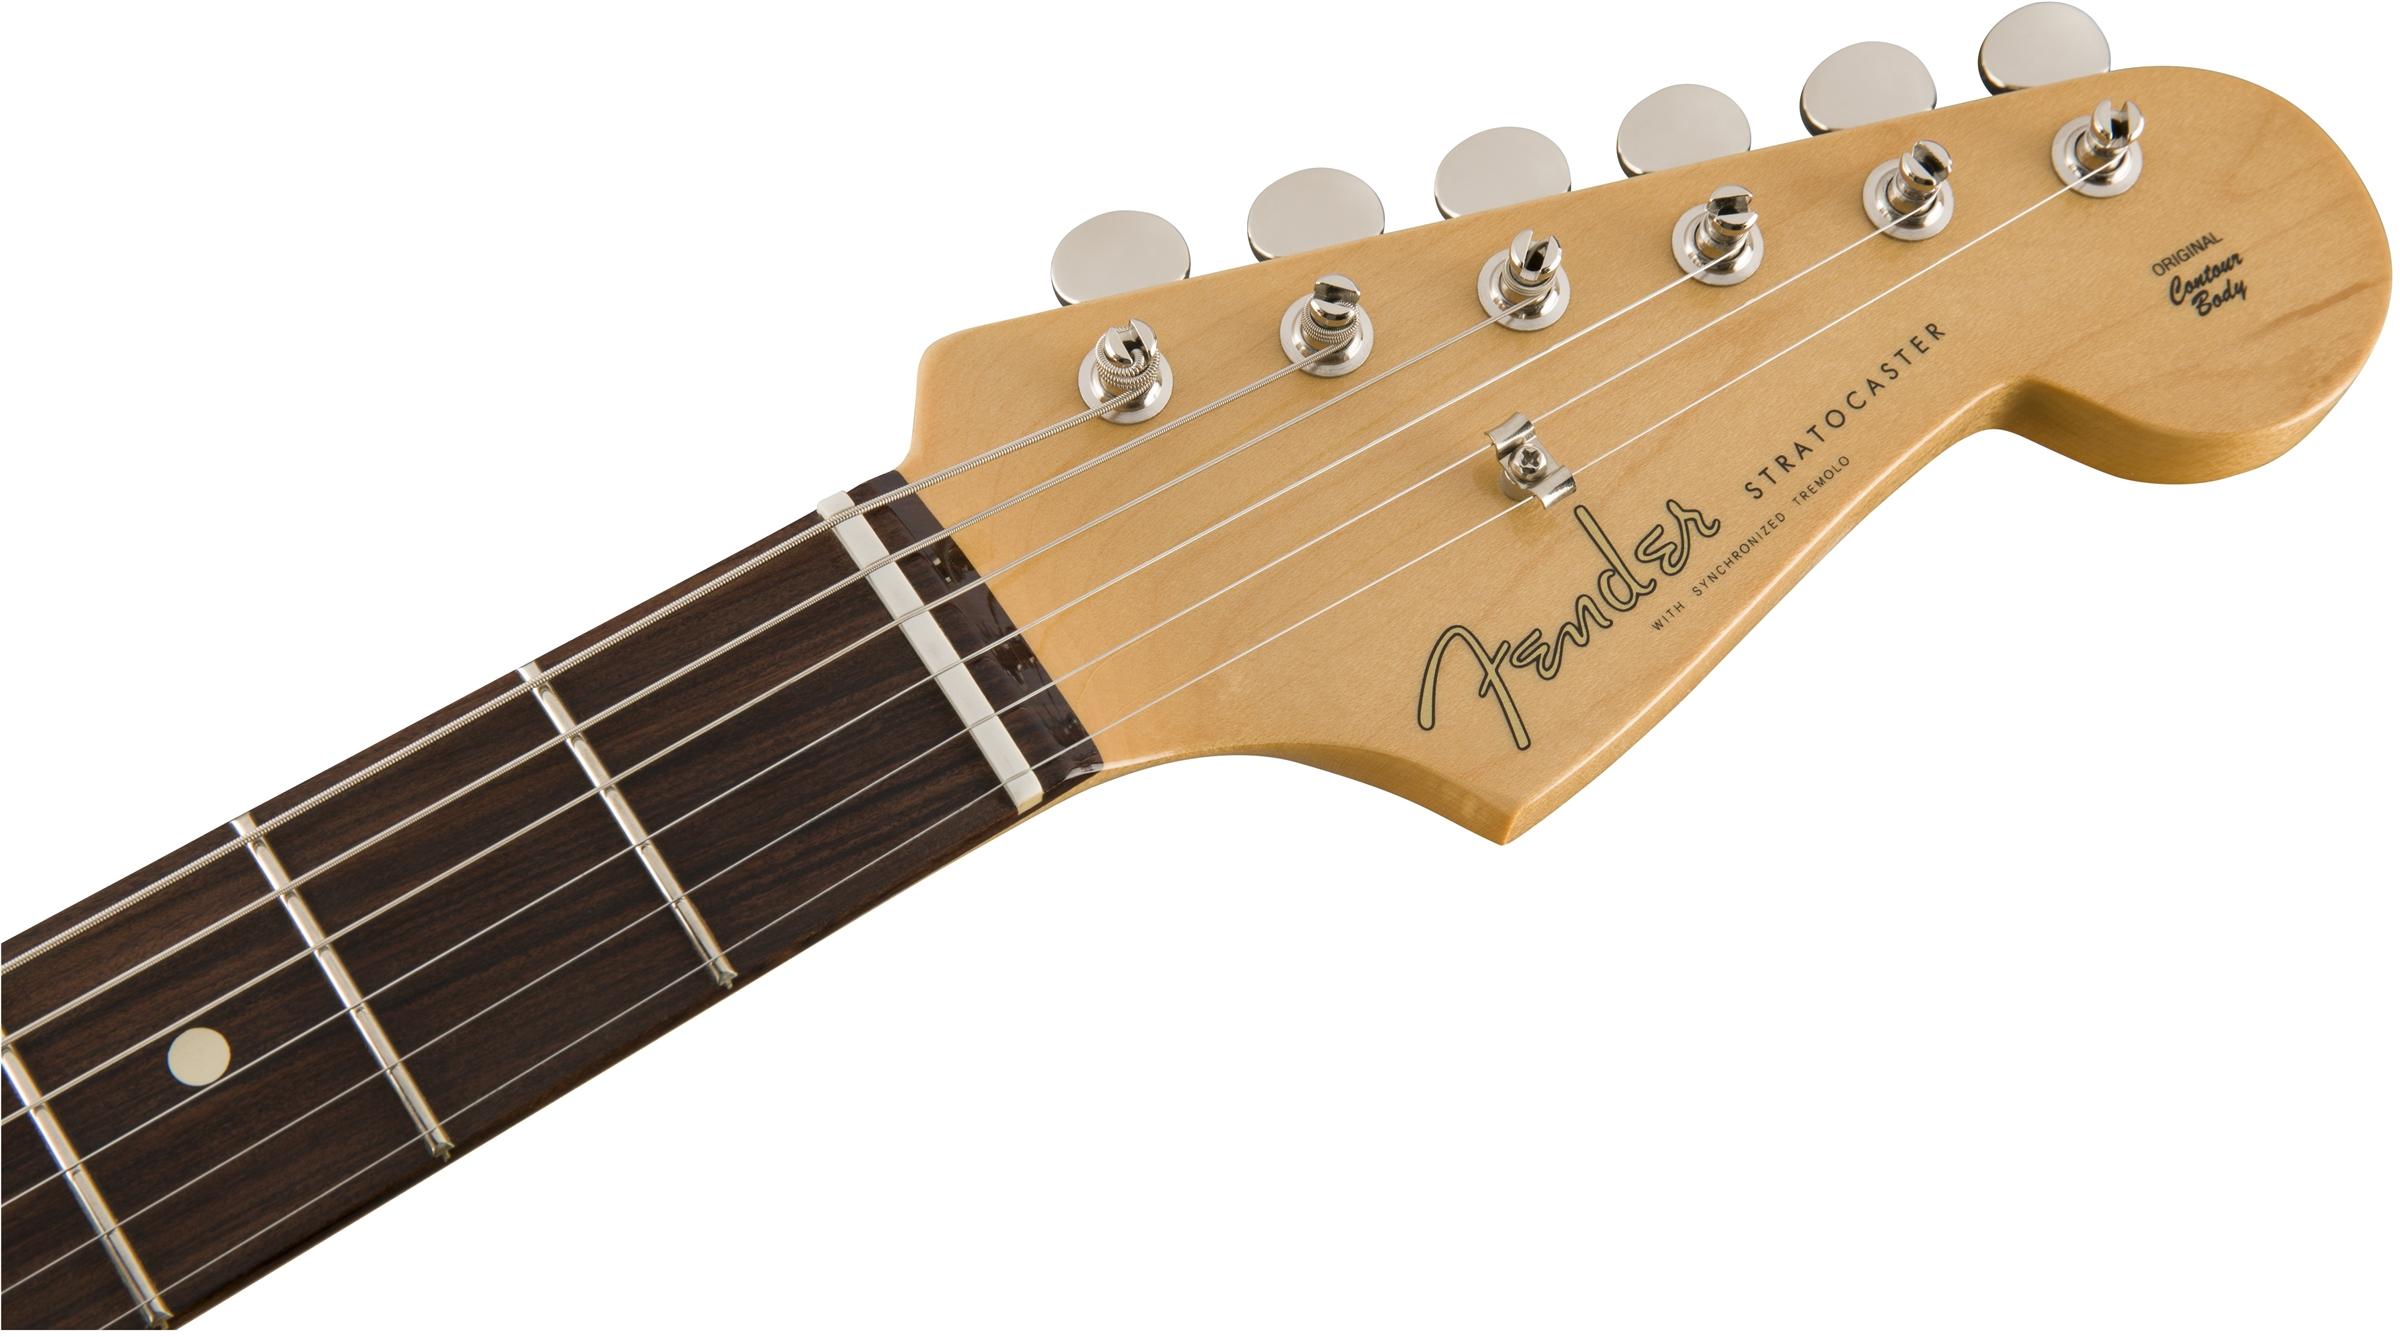 Fender Stratocaster Hss Wiring Diagram Color Further